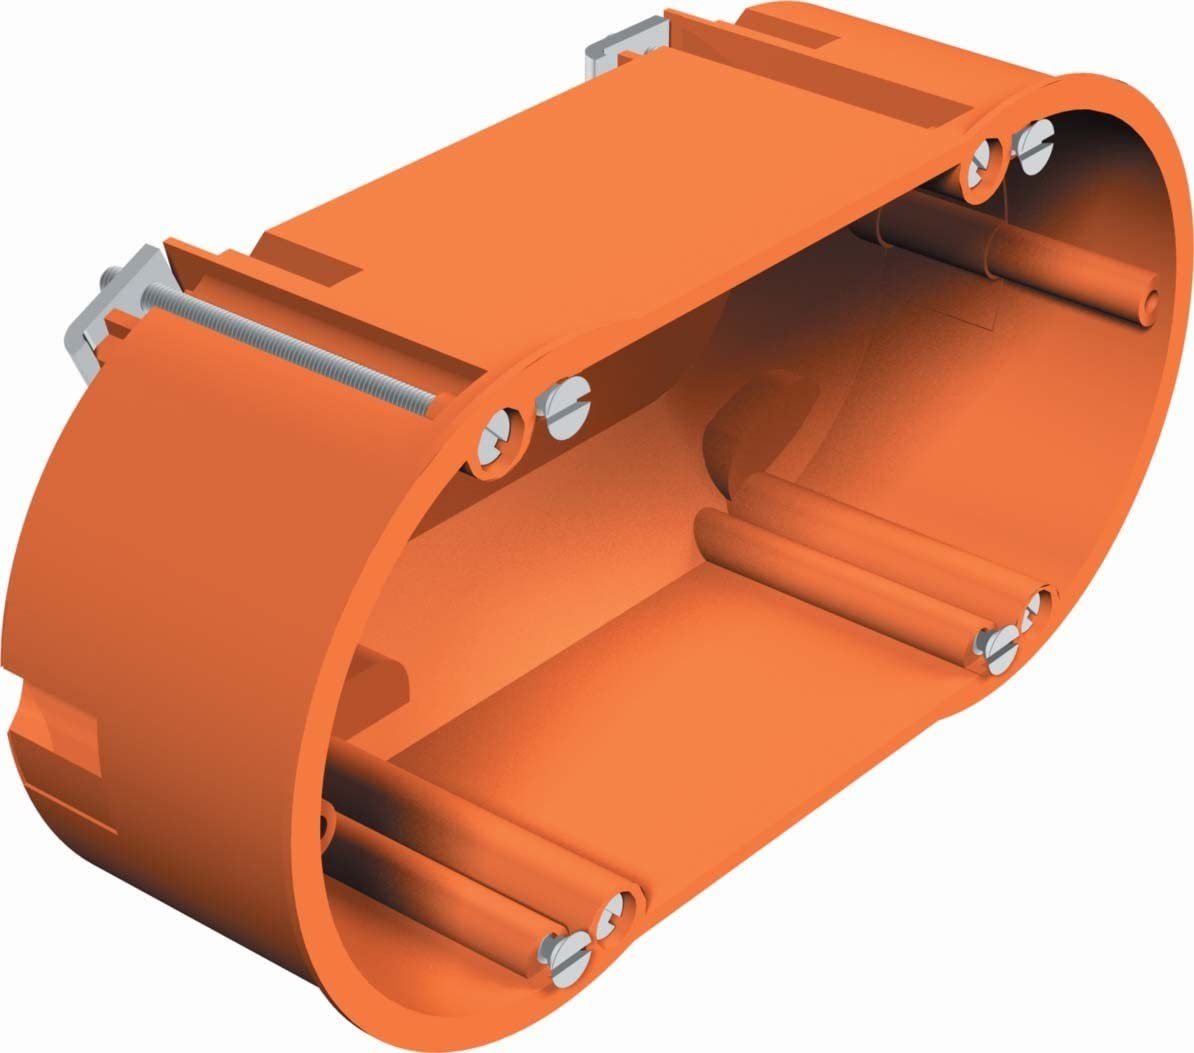 Obo-bettermann sistema conex.fij. - Caja empotrar mecanismo hg60/2 ...